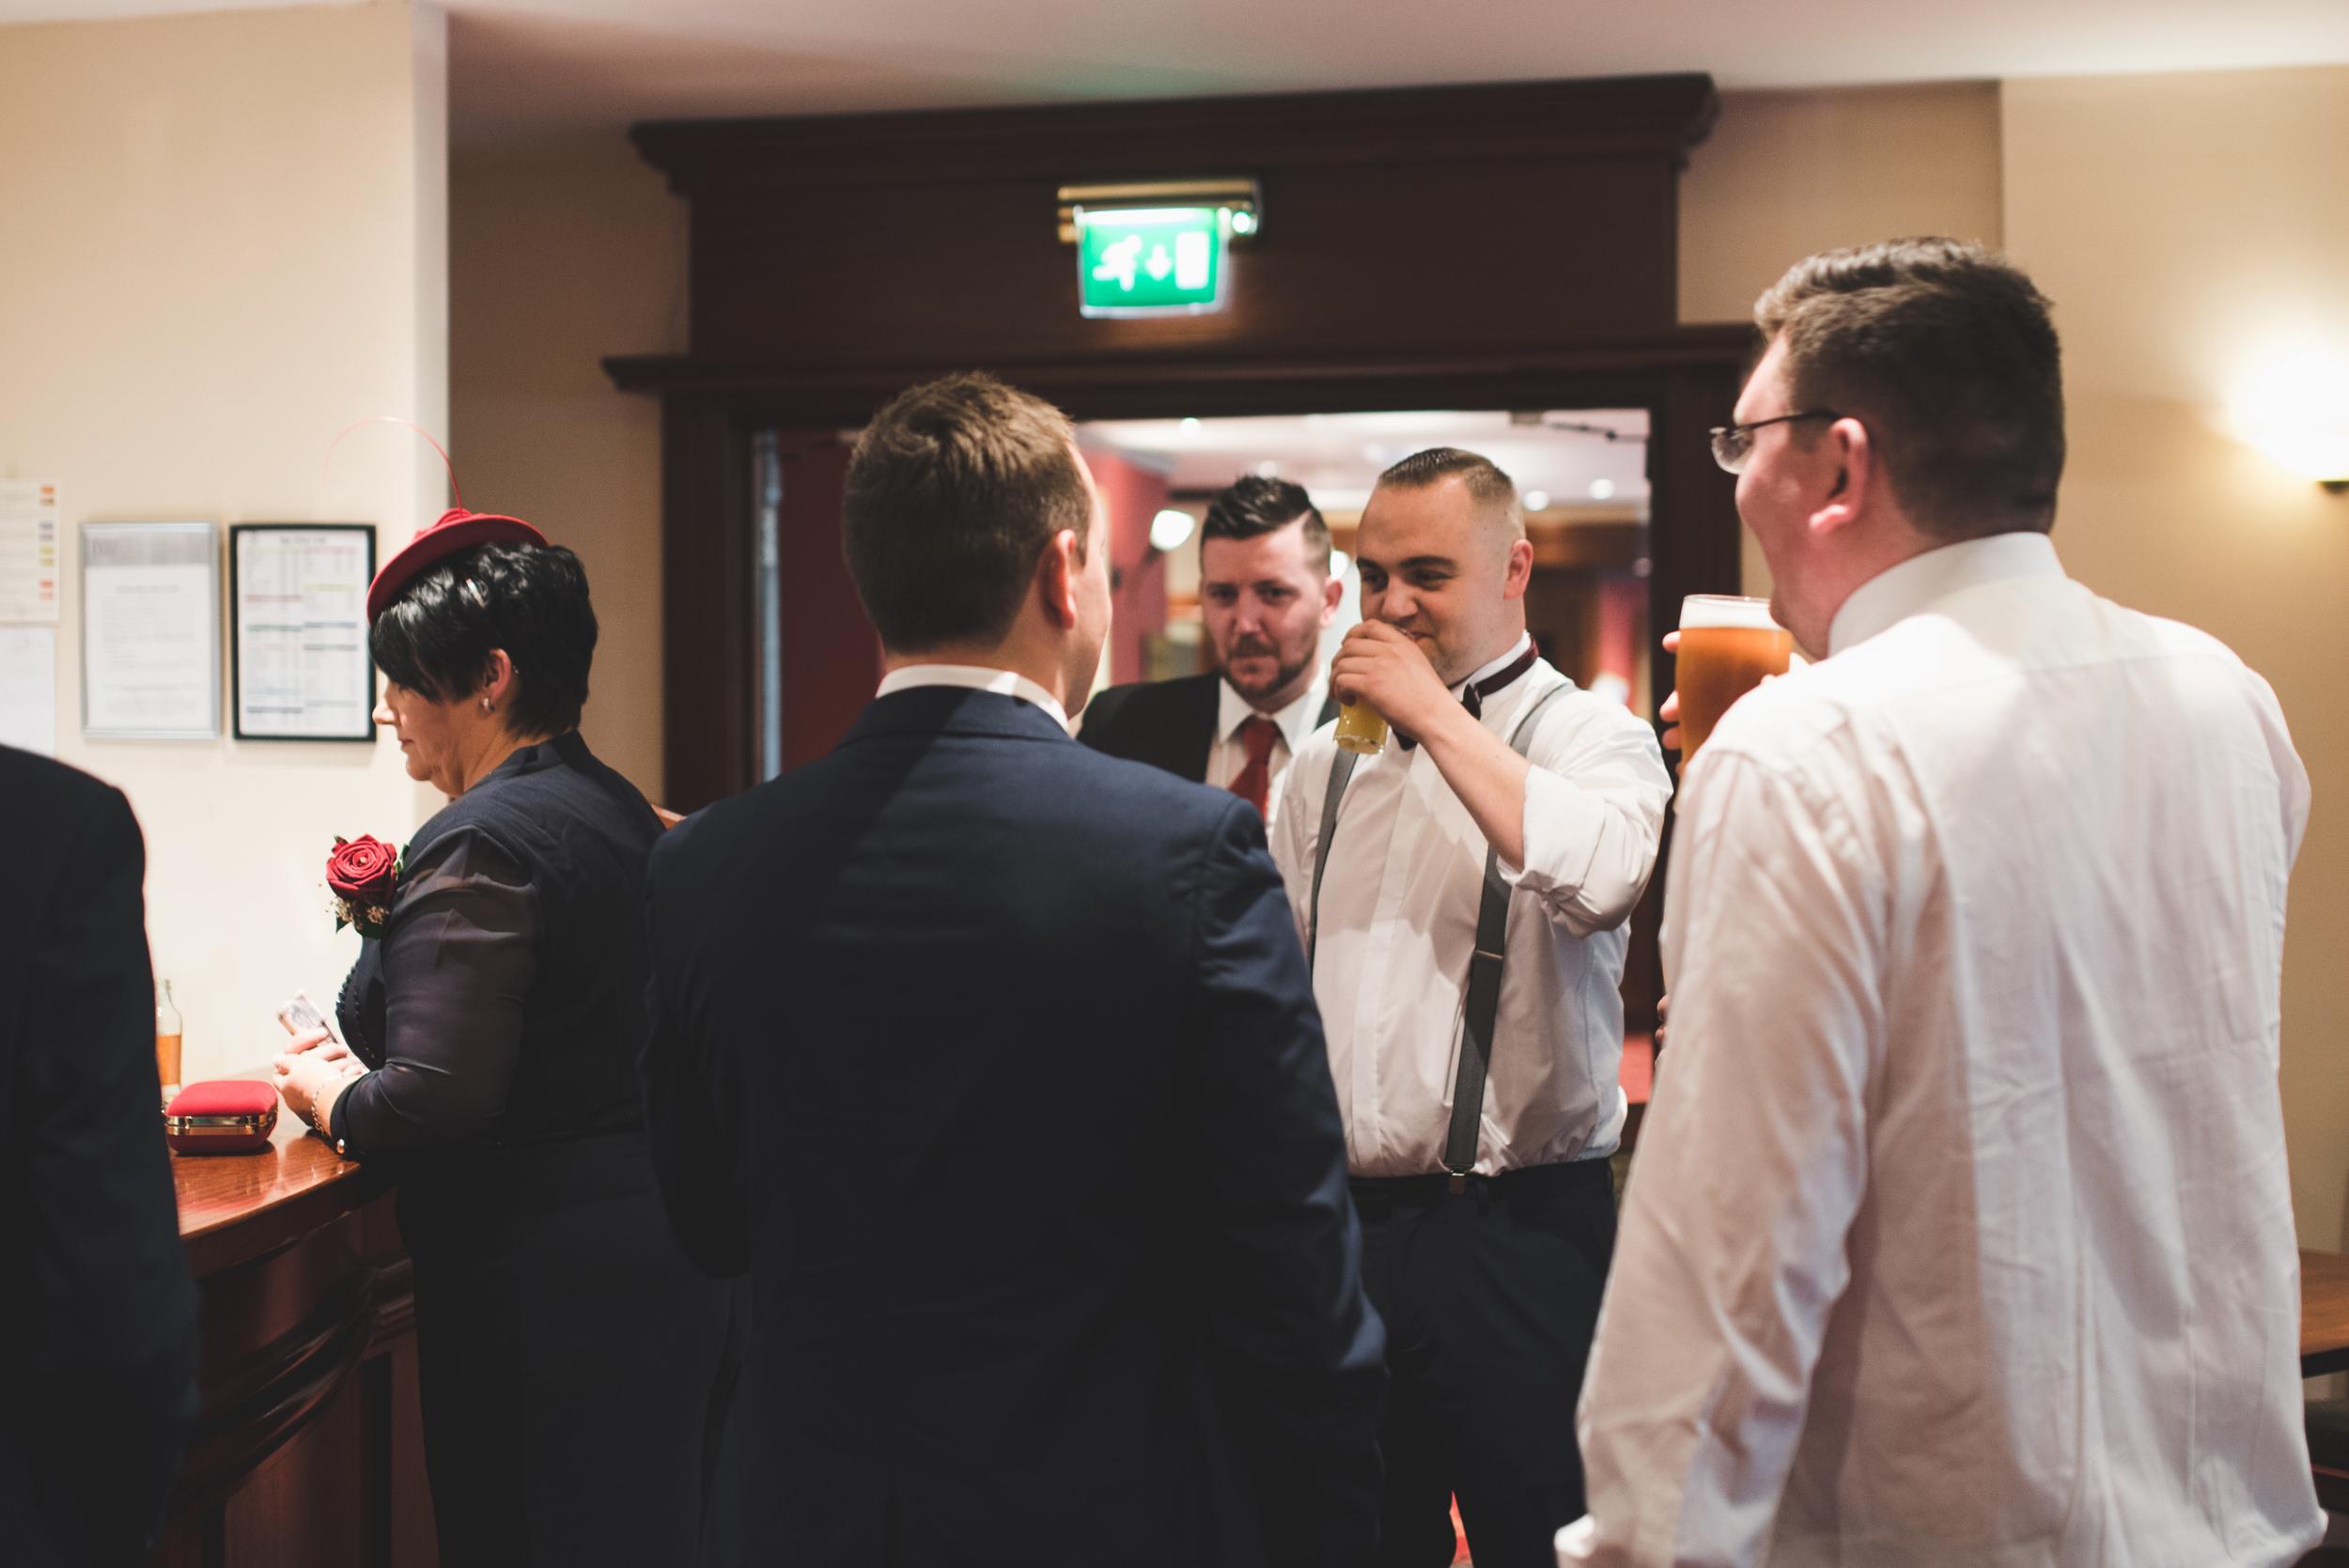 Northern_Ireland_Wedding_Photographer_Purephotoni_Dunsilly_Hotel_Groom_Drinking